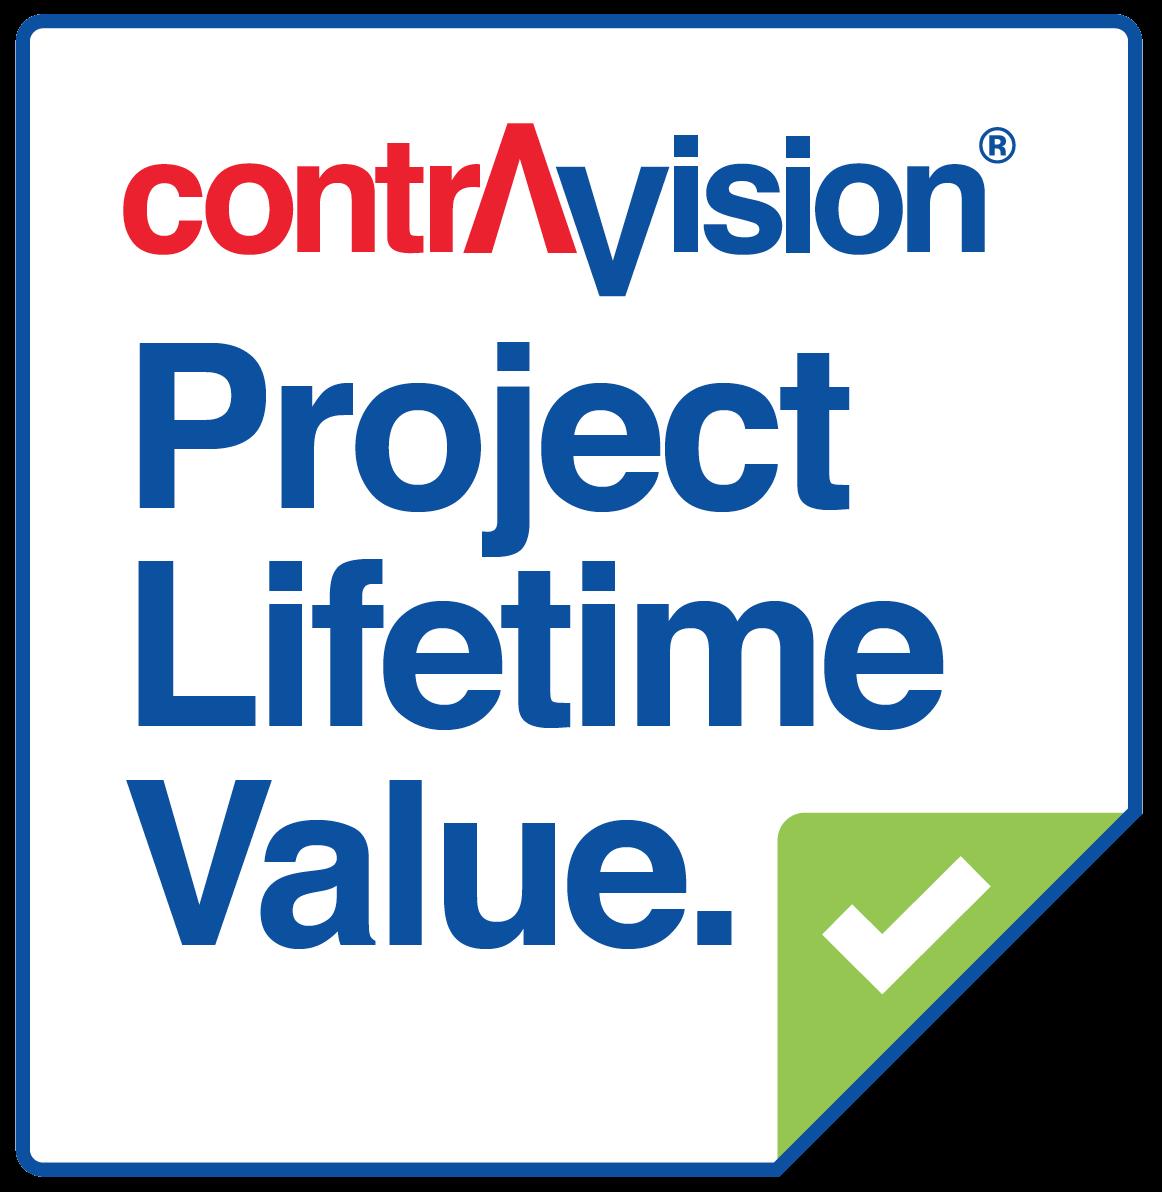 Contra Vision Project Lifetime Value logo